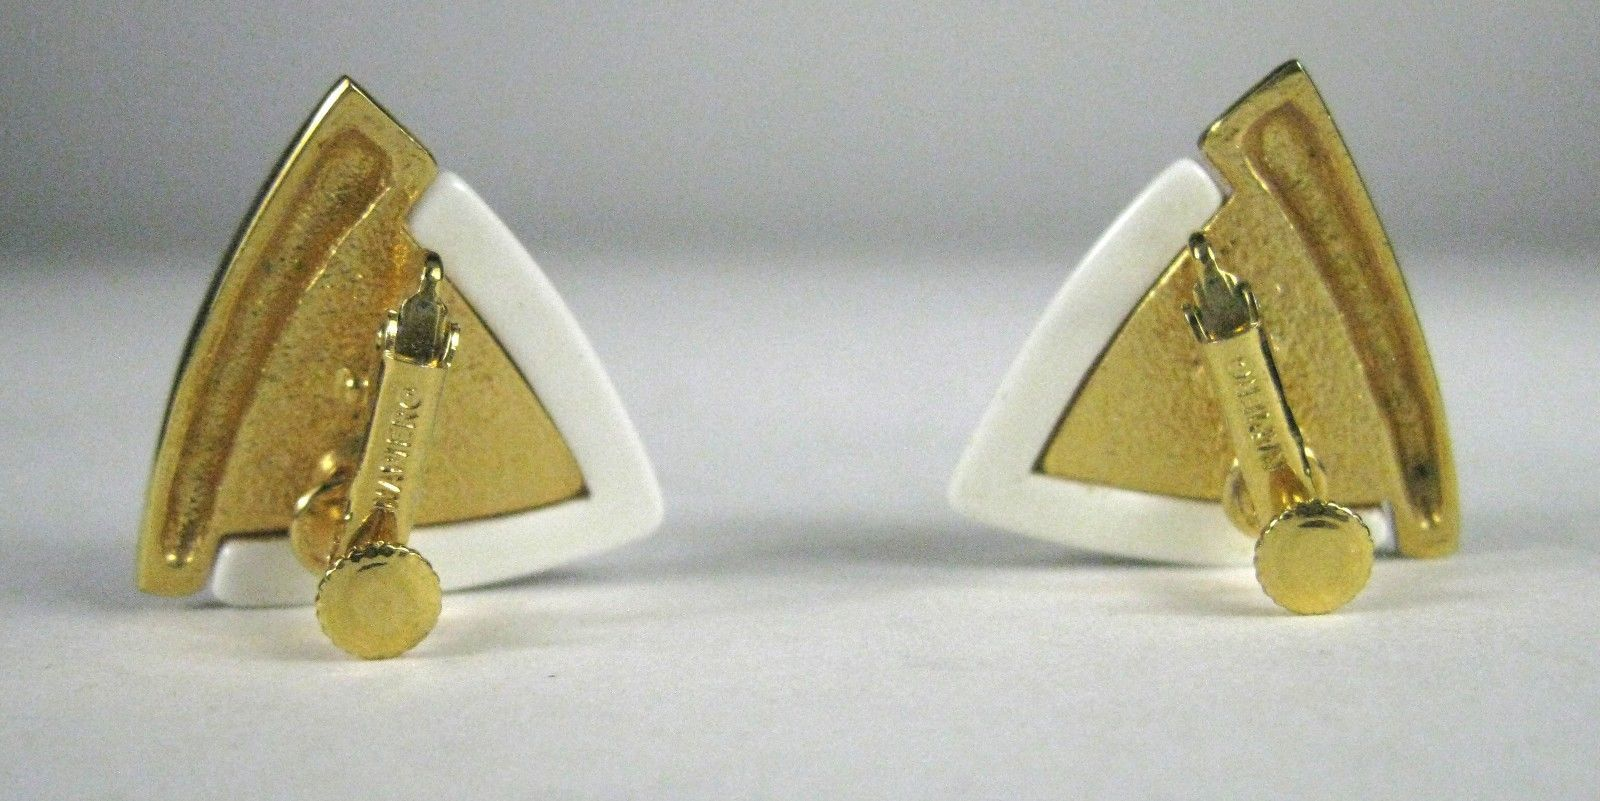 NAPIER Clip Earring Screw Back White Lucite Goldtone Signed VTG Vintage image 3